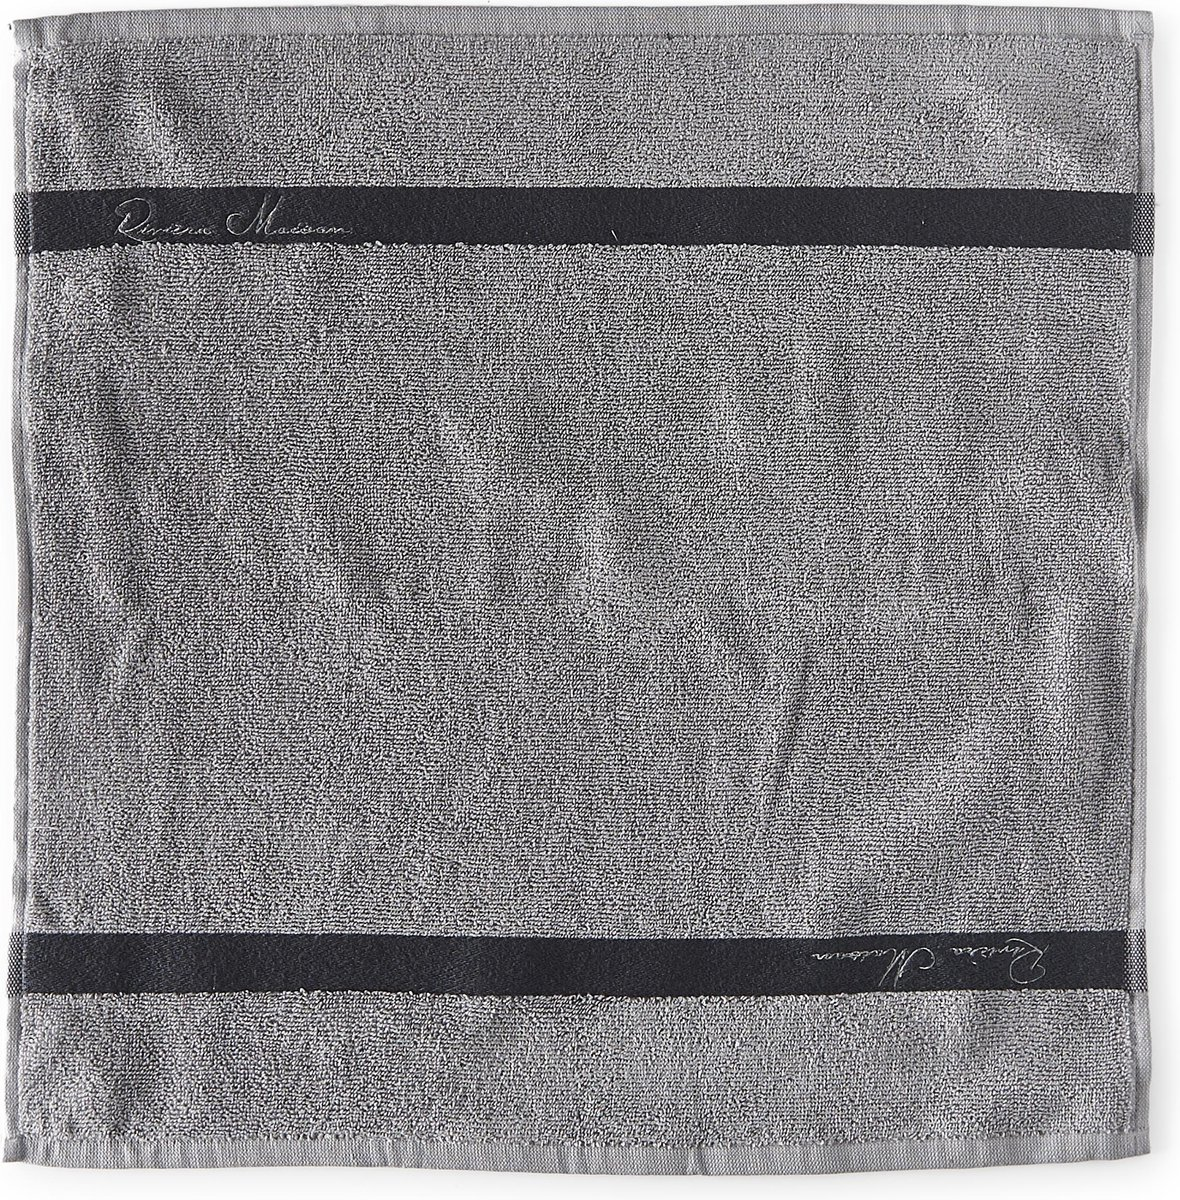 Riviera Maison - Kitchen Towel - dove grey - 50x50 - Riviera Maison